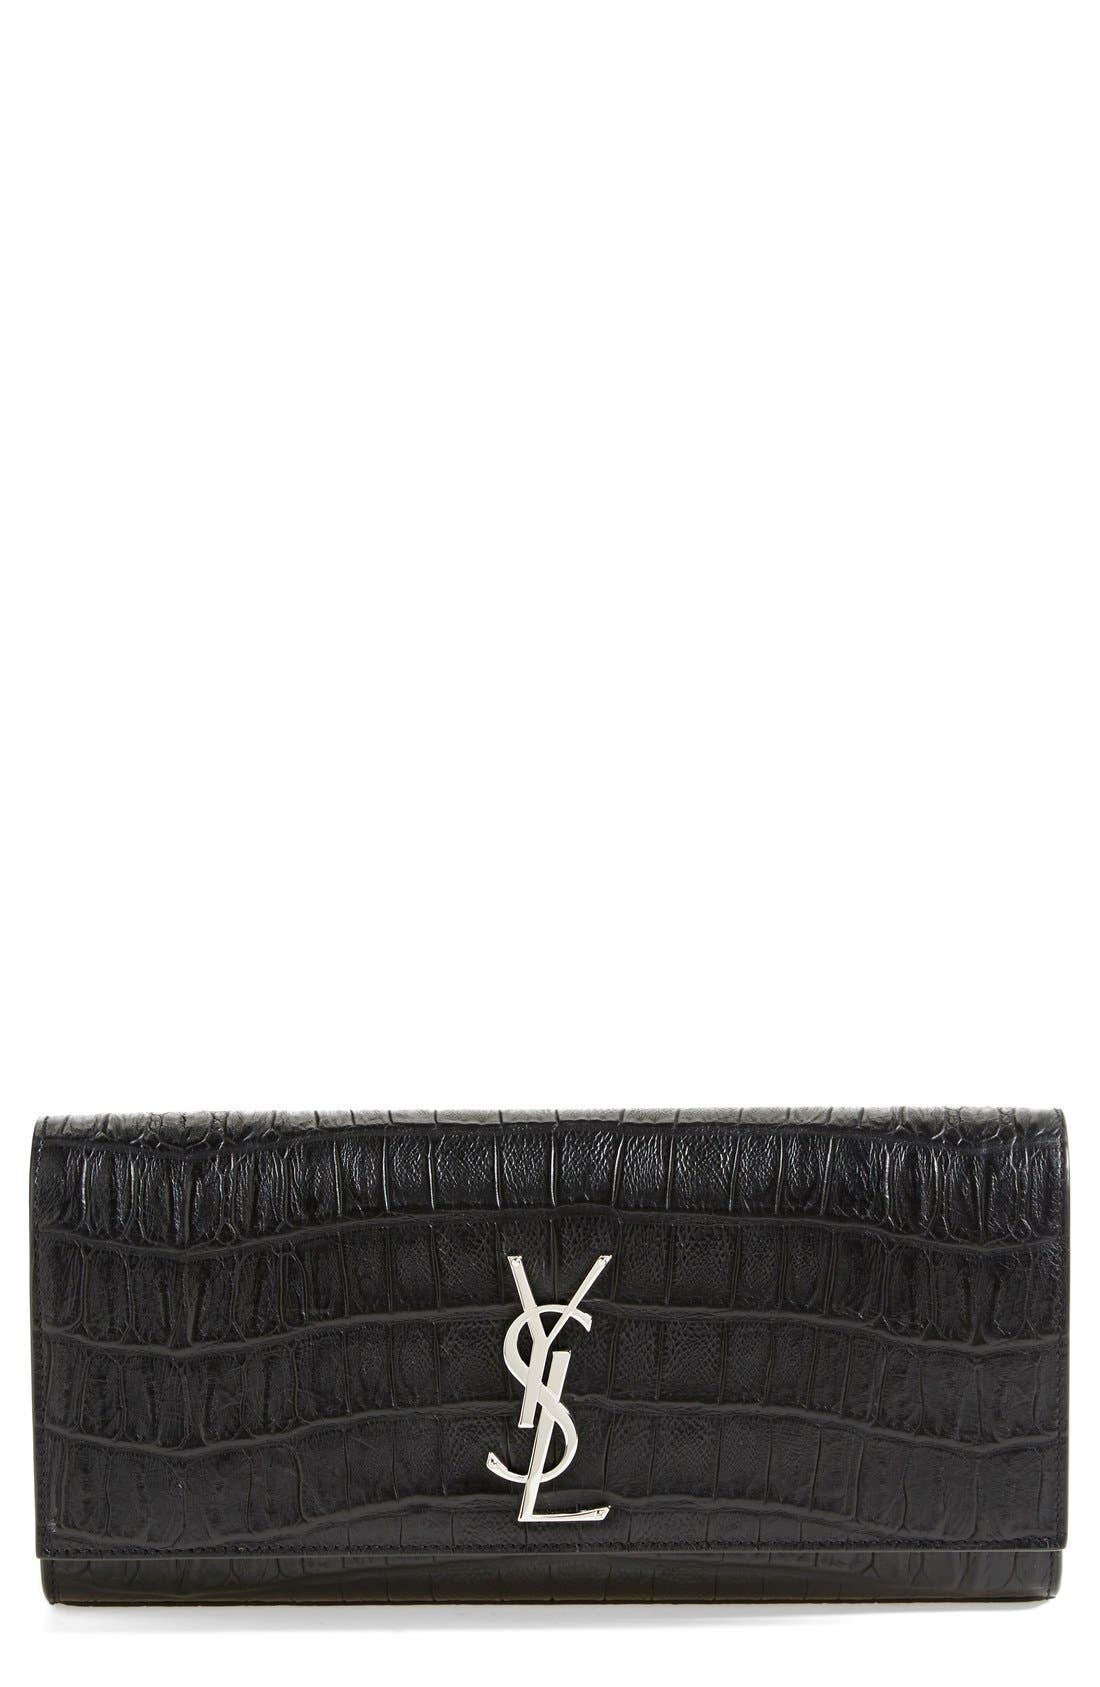 Alternate Image 1 Selected - Saint Laurent 'Cassandre' Croc Embossed Leather Clutch